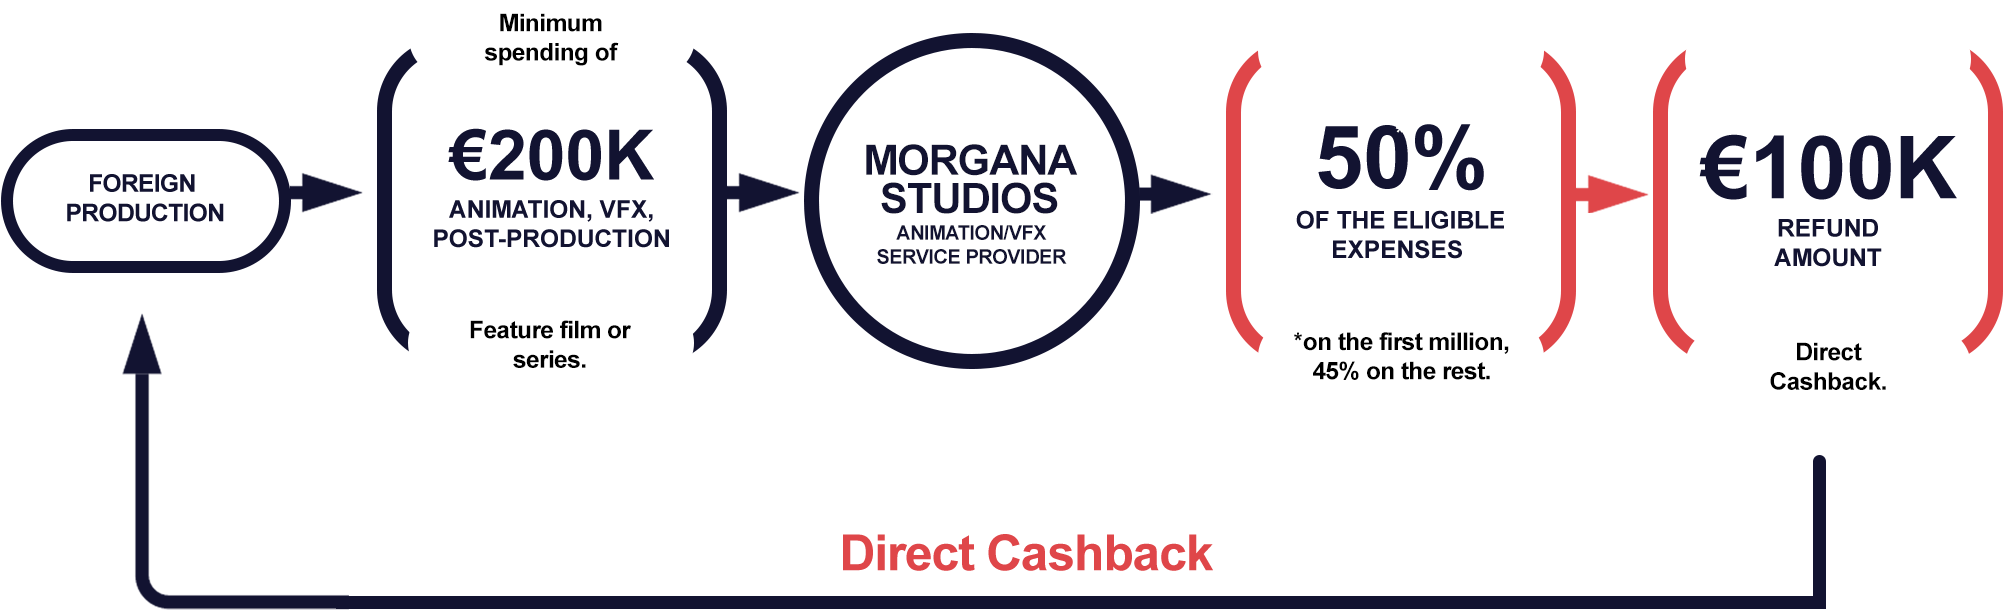 morgana studios madrid canary islands cashback incentive case example